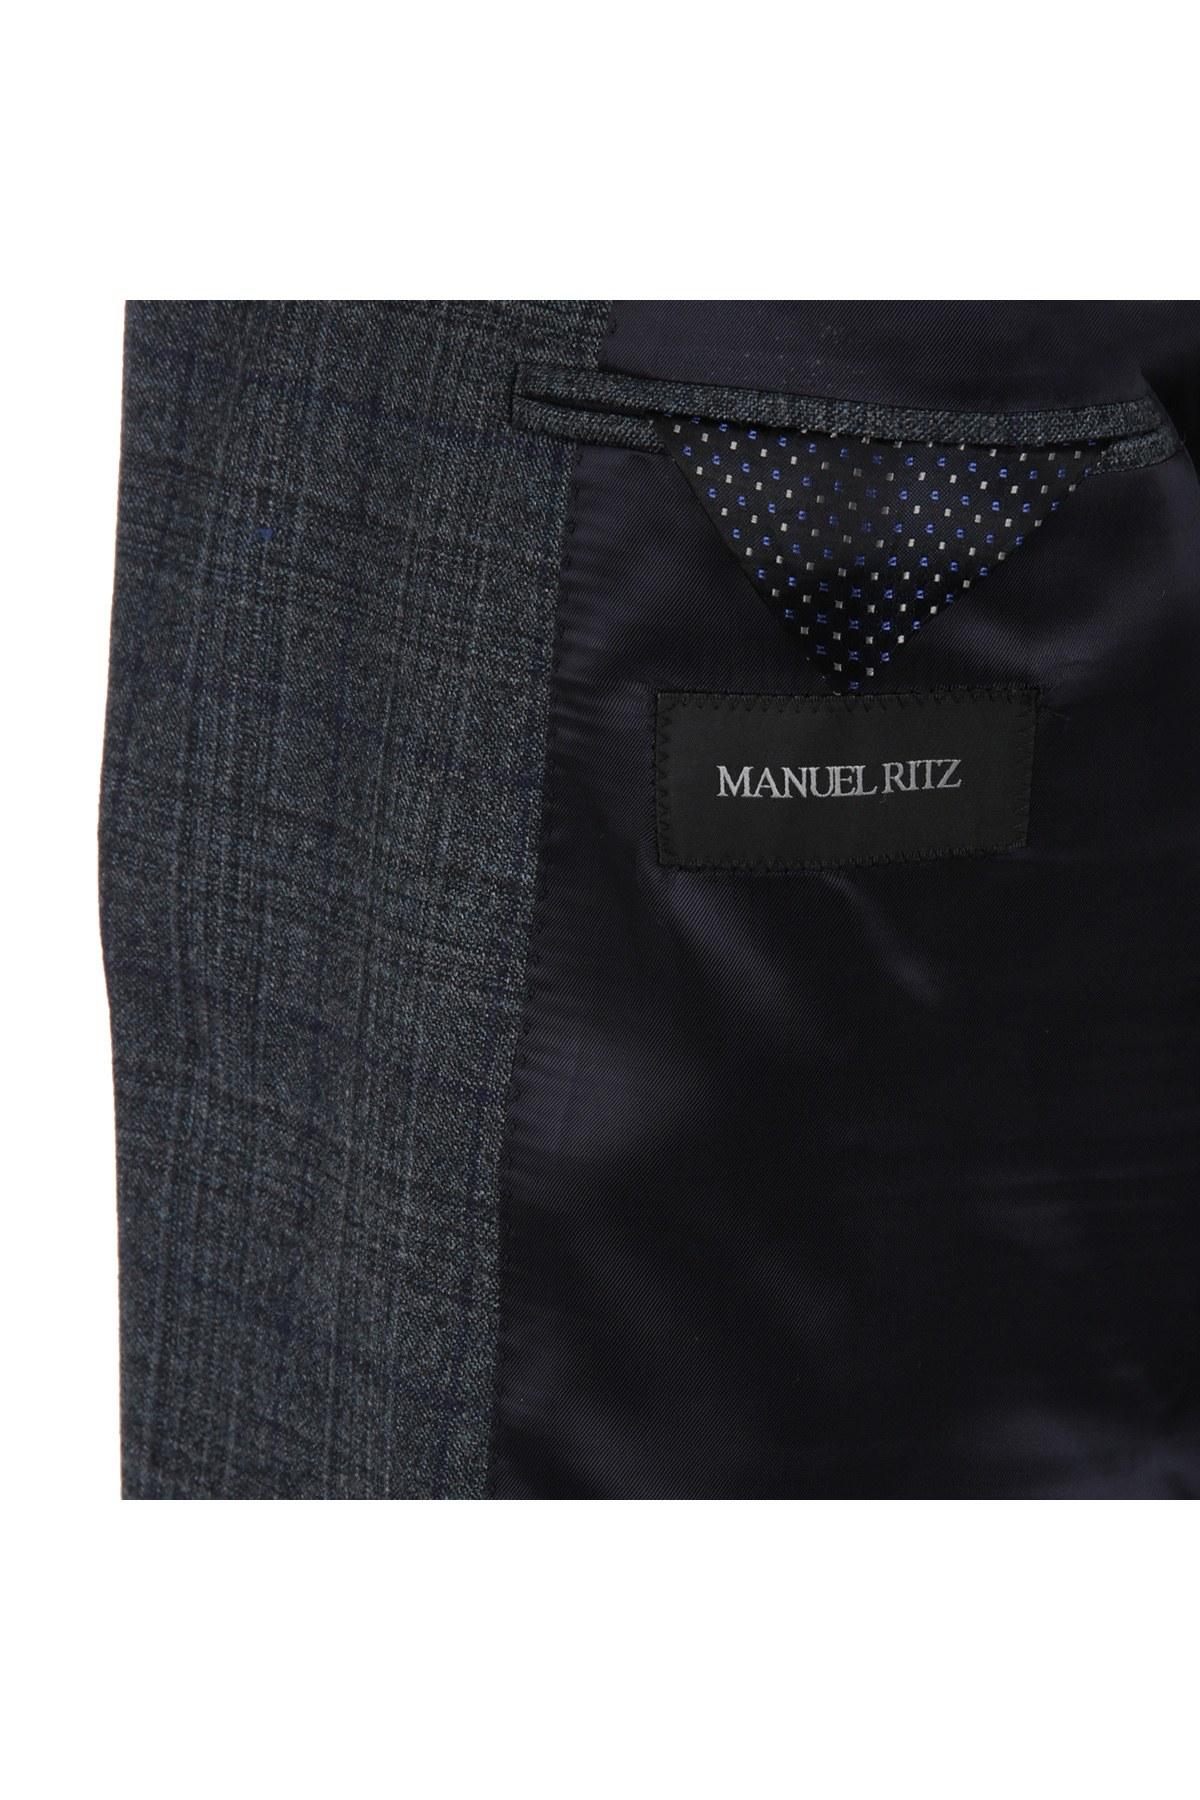 MANUEL RITZ Erkek Takım 2311A448M171574 FÜME